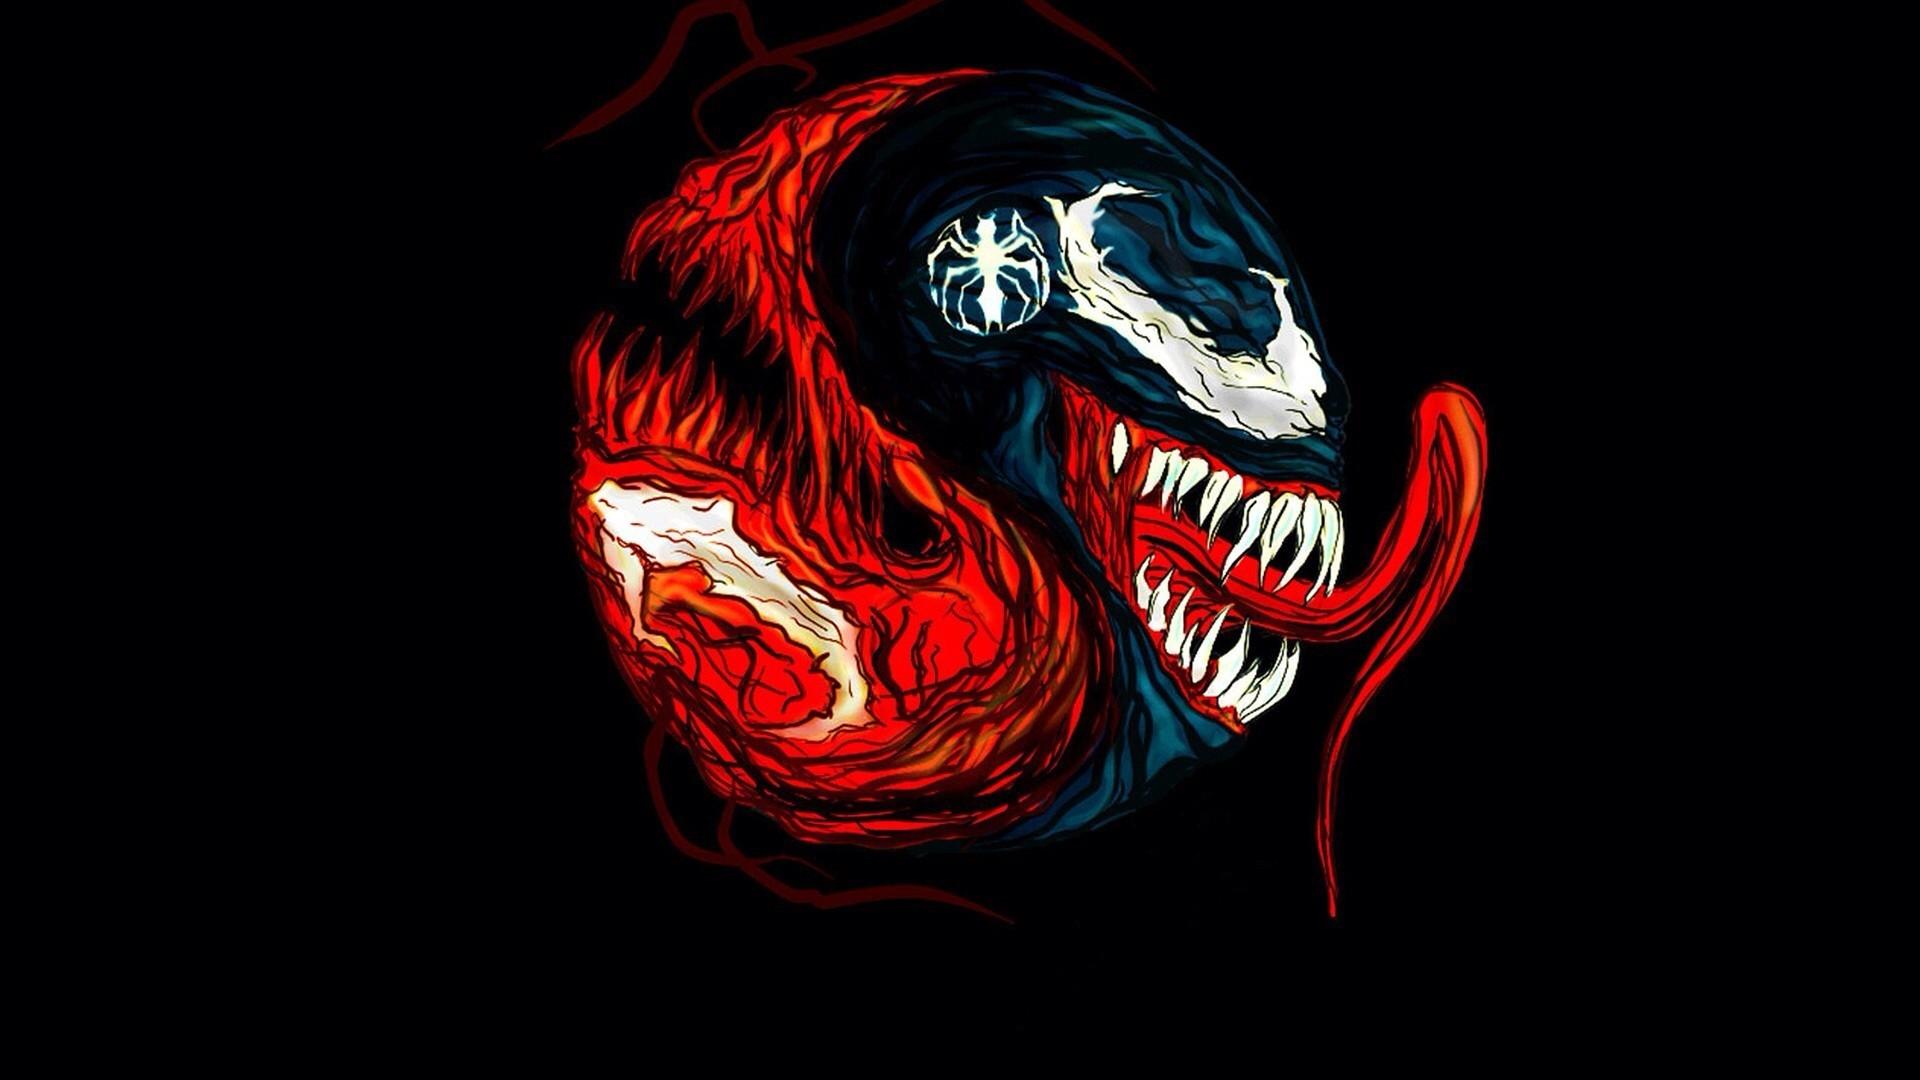 Bullet For My Valentine Wallpaper Hd Venom Band Hd Wallpaper 183 ①